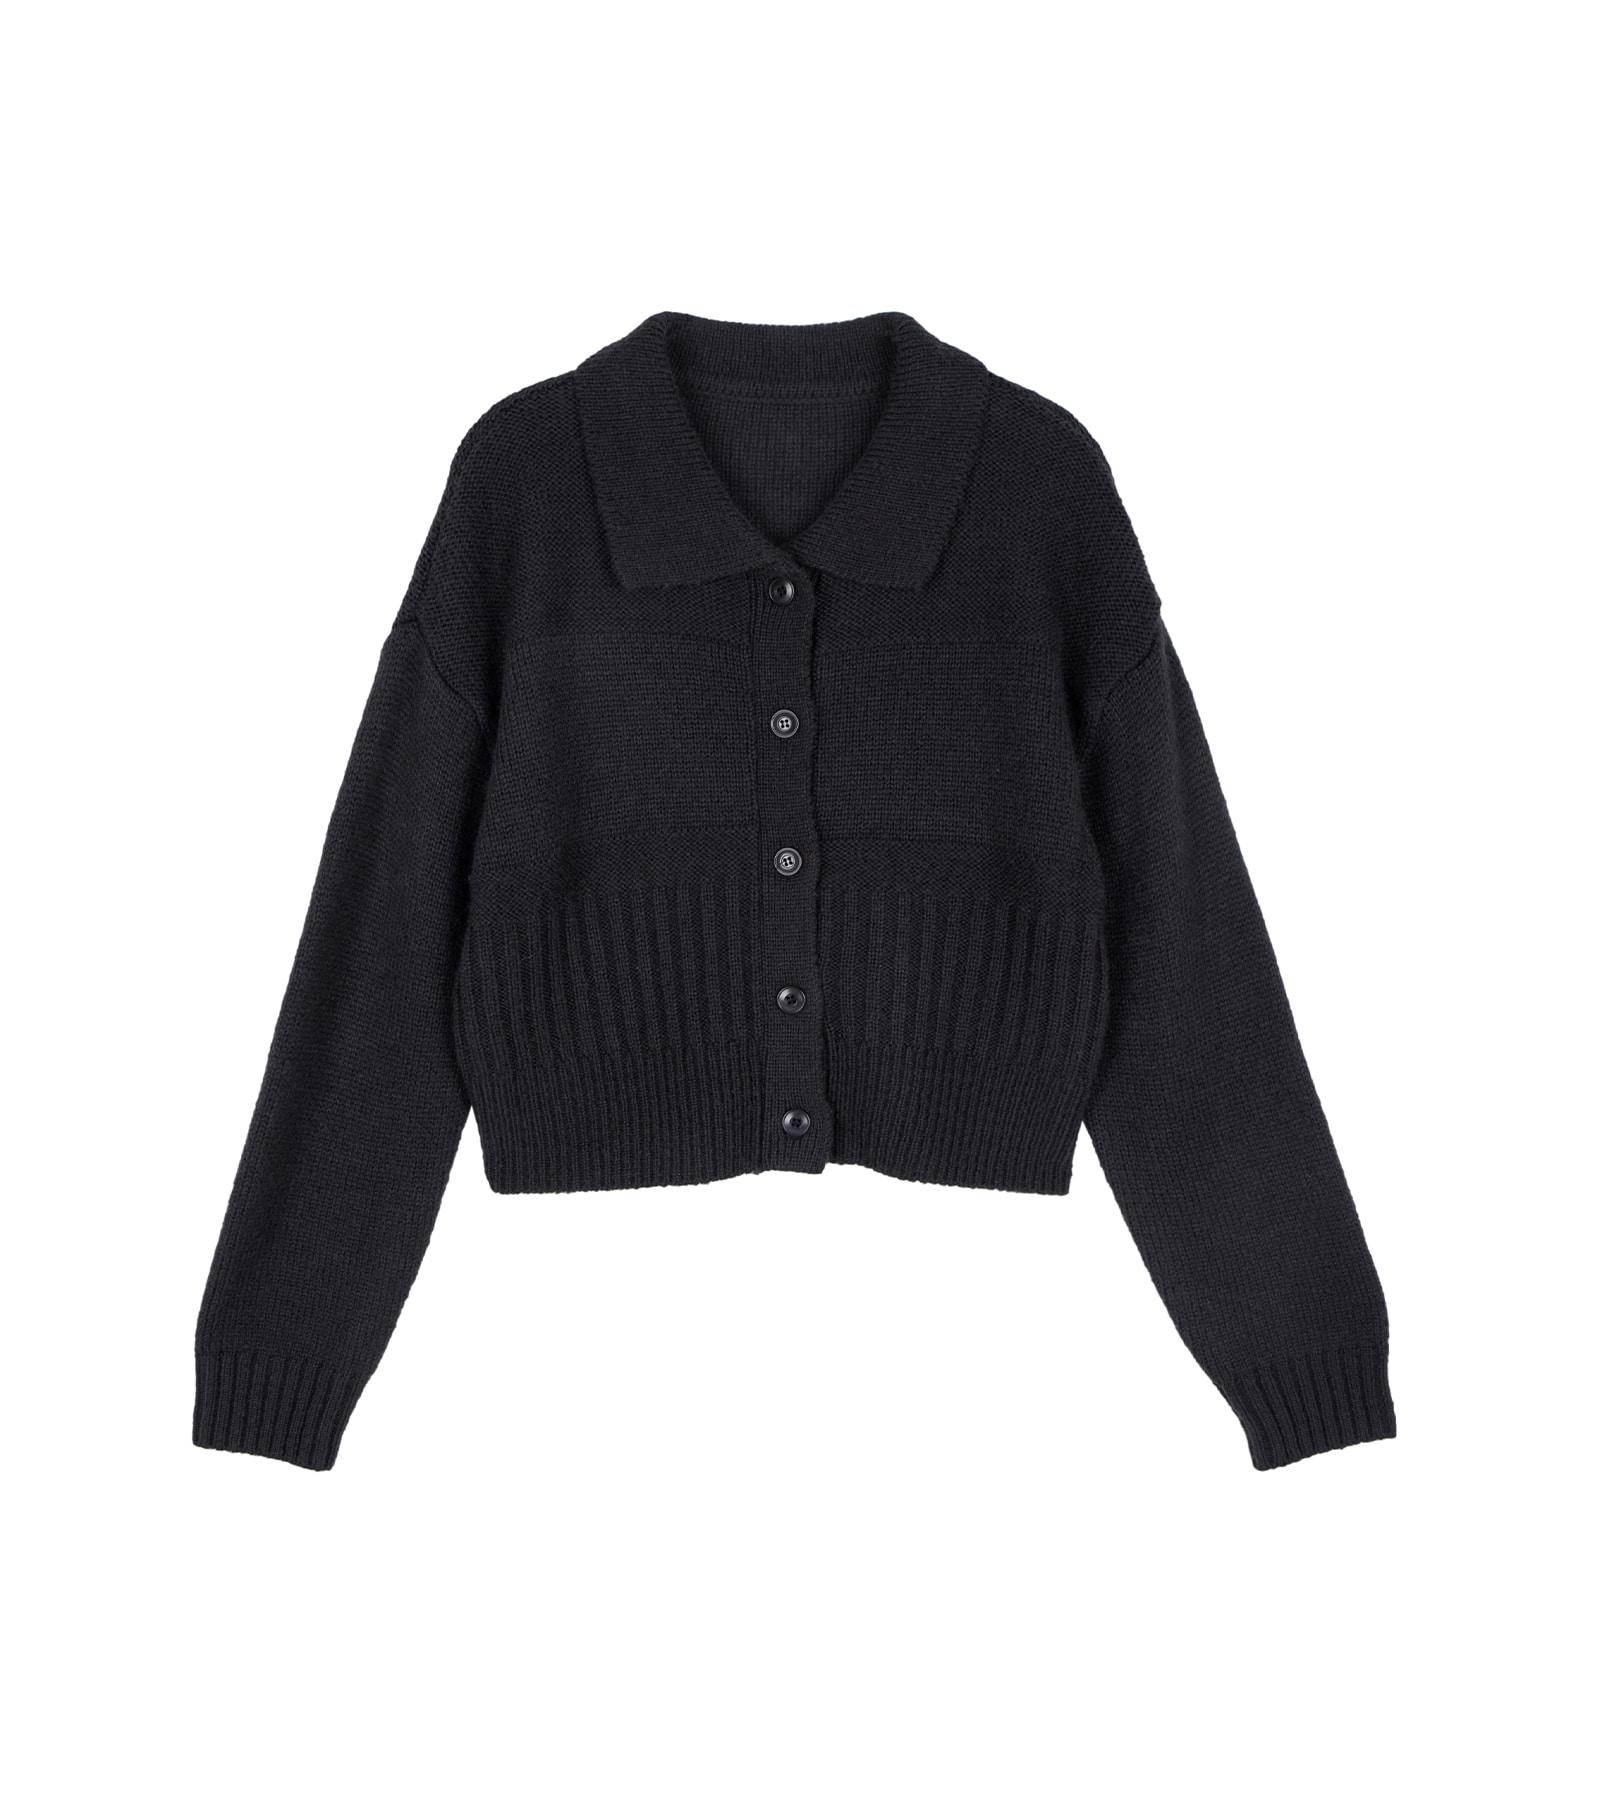 Beefit collar knit cardigan